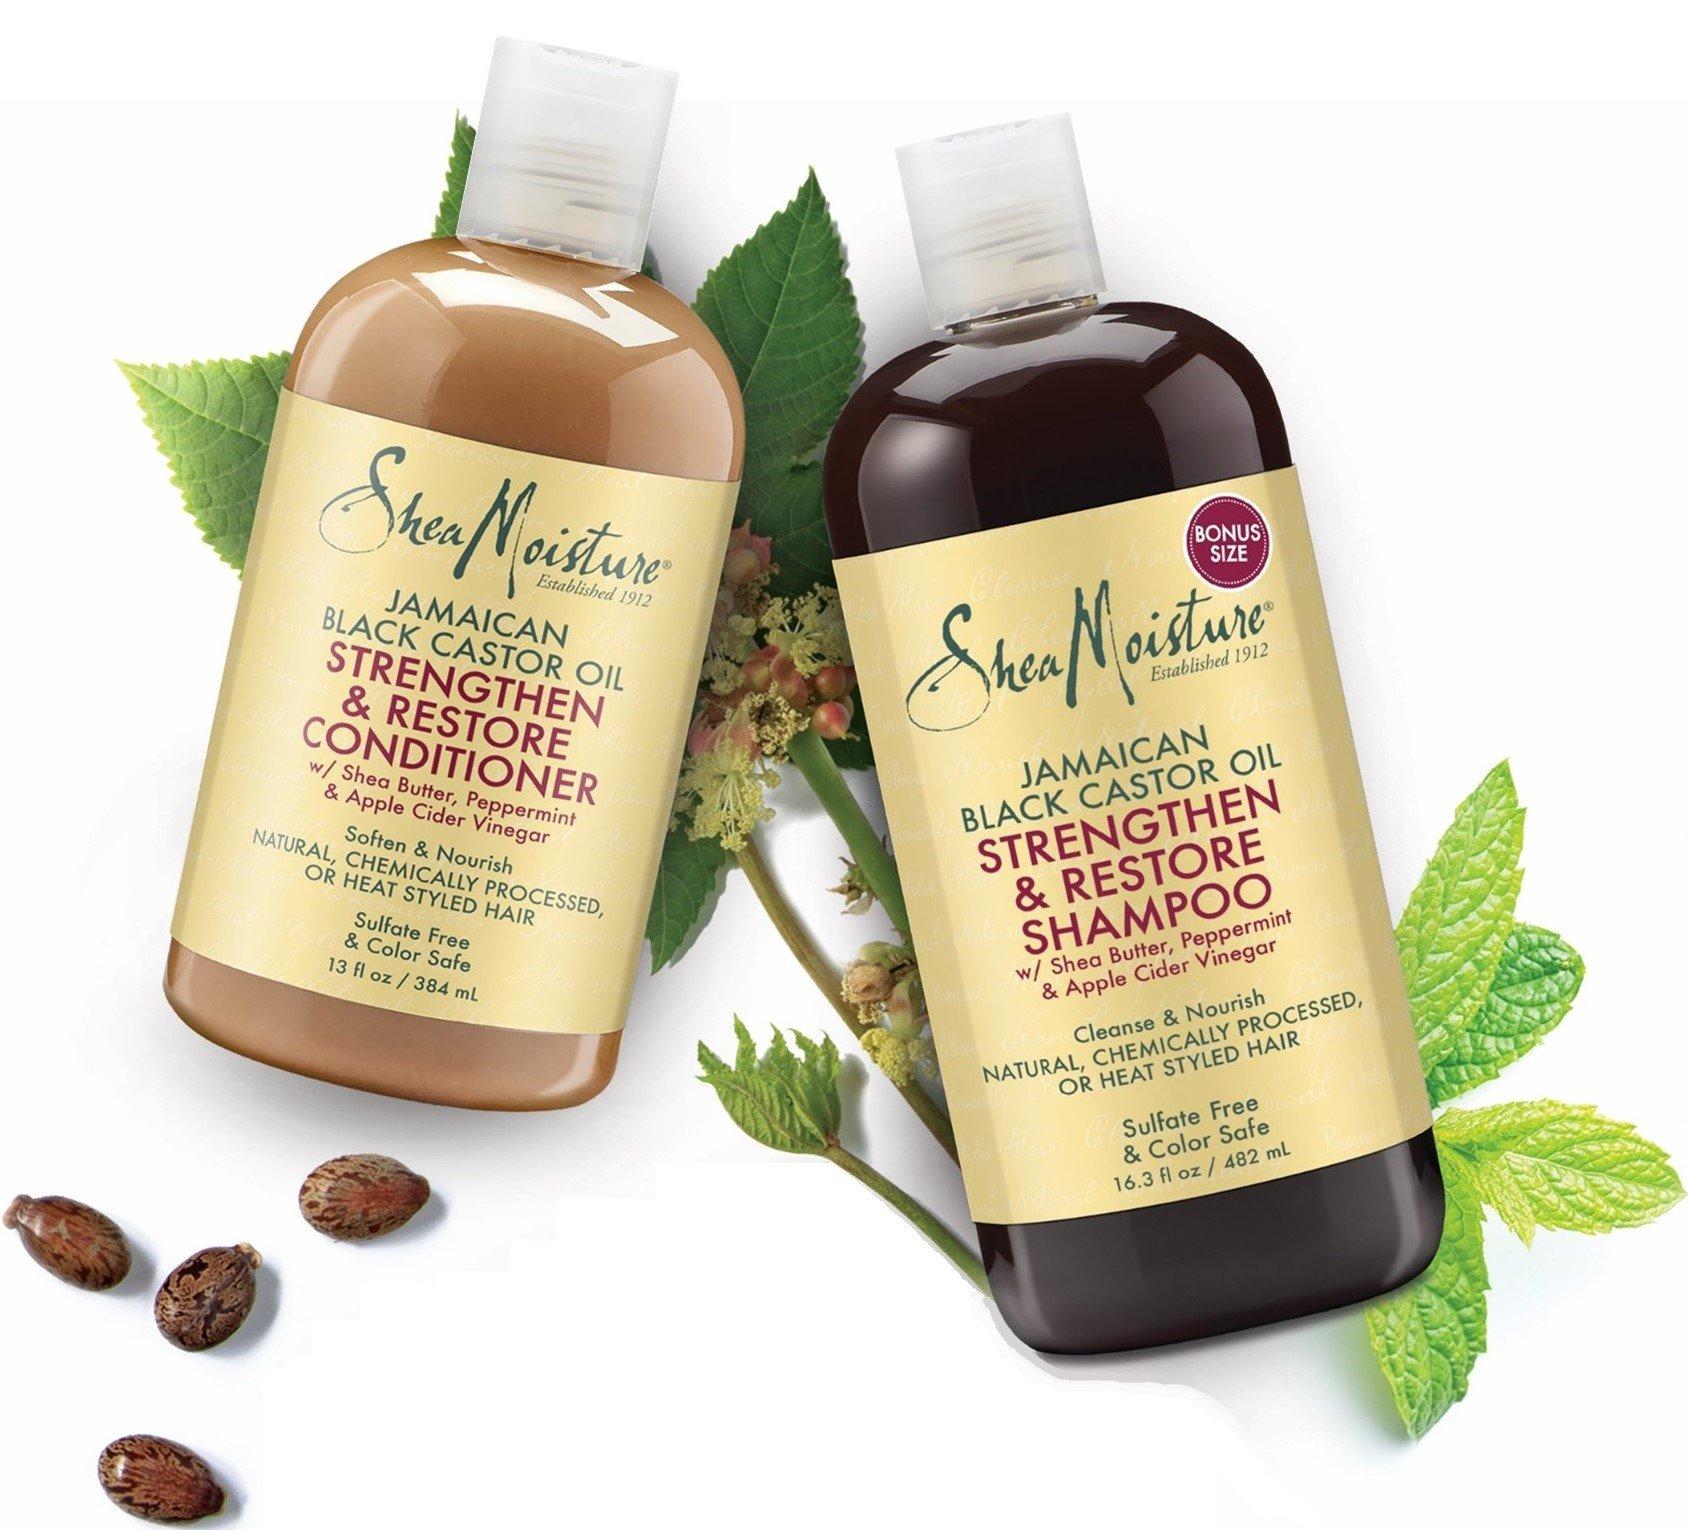 Shea Moisture  Strengthen, Grow & Restore Shampoo and Conditioner Set, Jamaican Black Castor Oil Combination Pack, 16.3 oz Shampoo & 13 oz. Conditioner by Shea Moisture (Image #7)